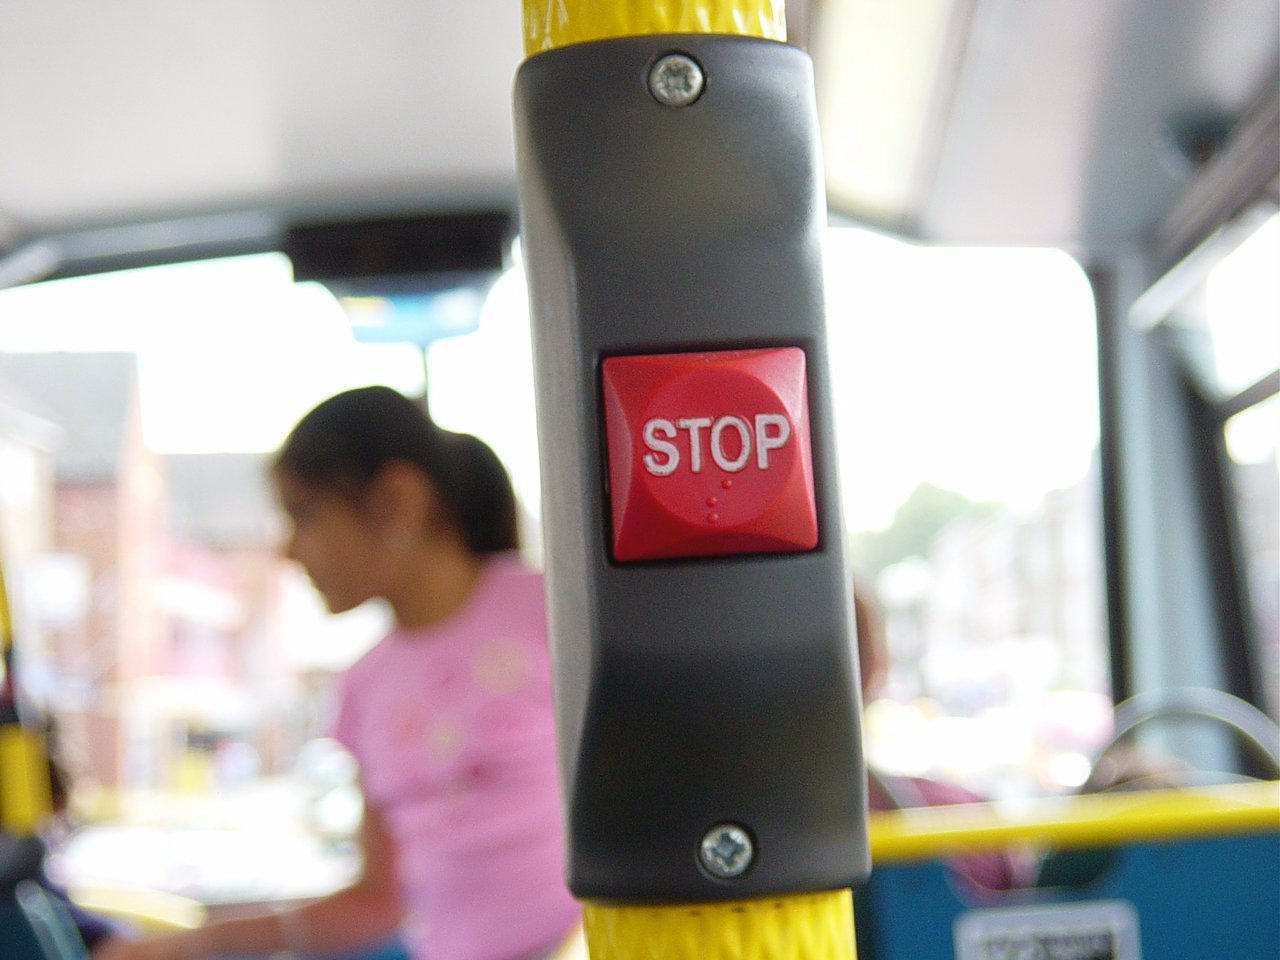 bus stop push button